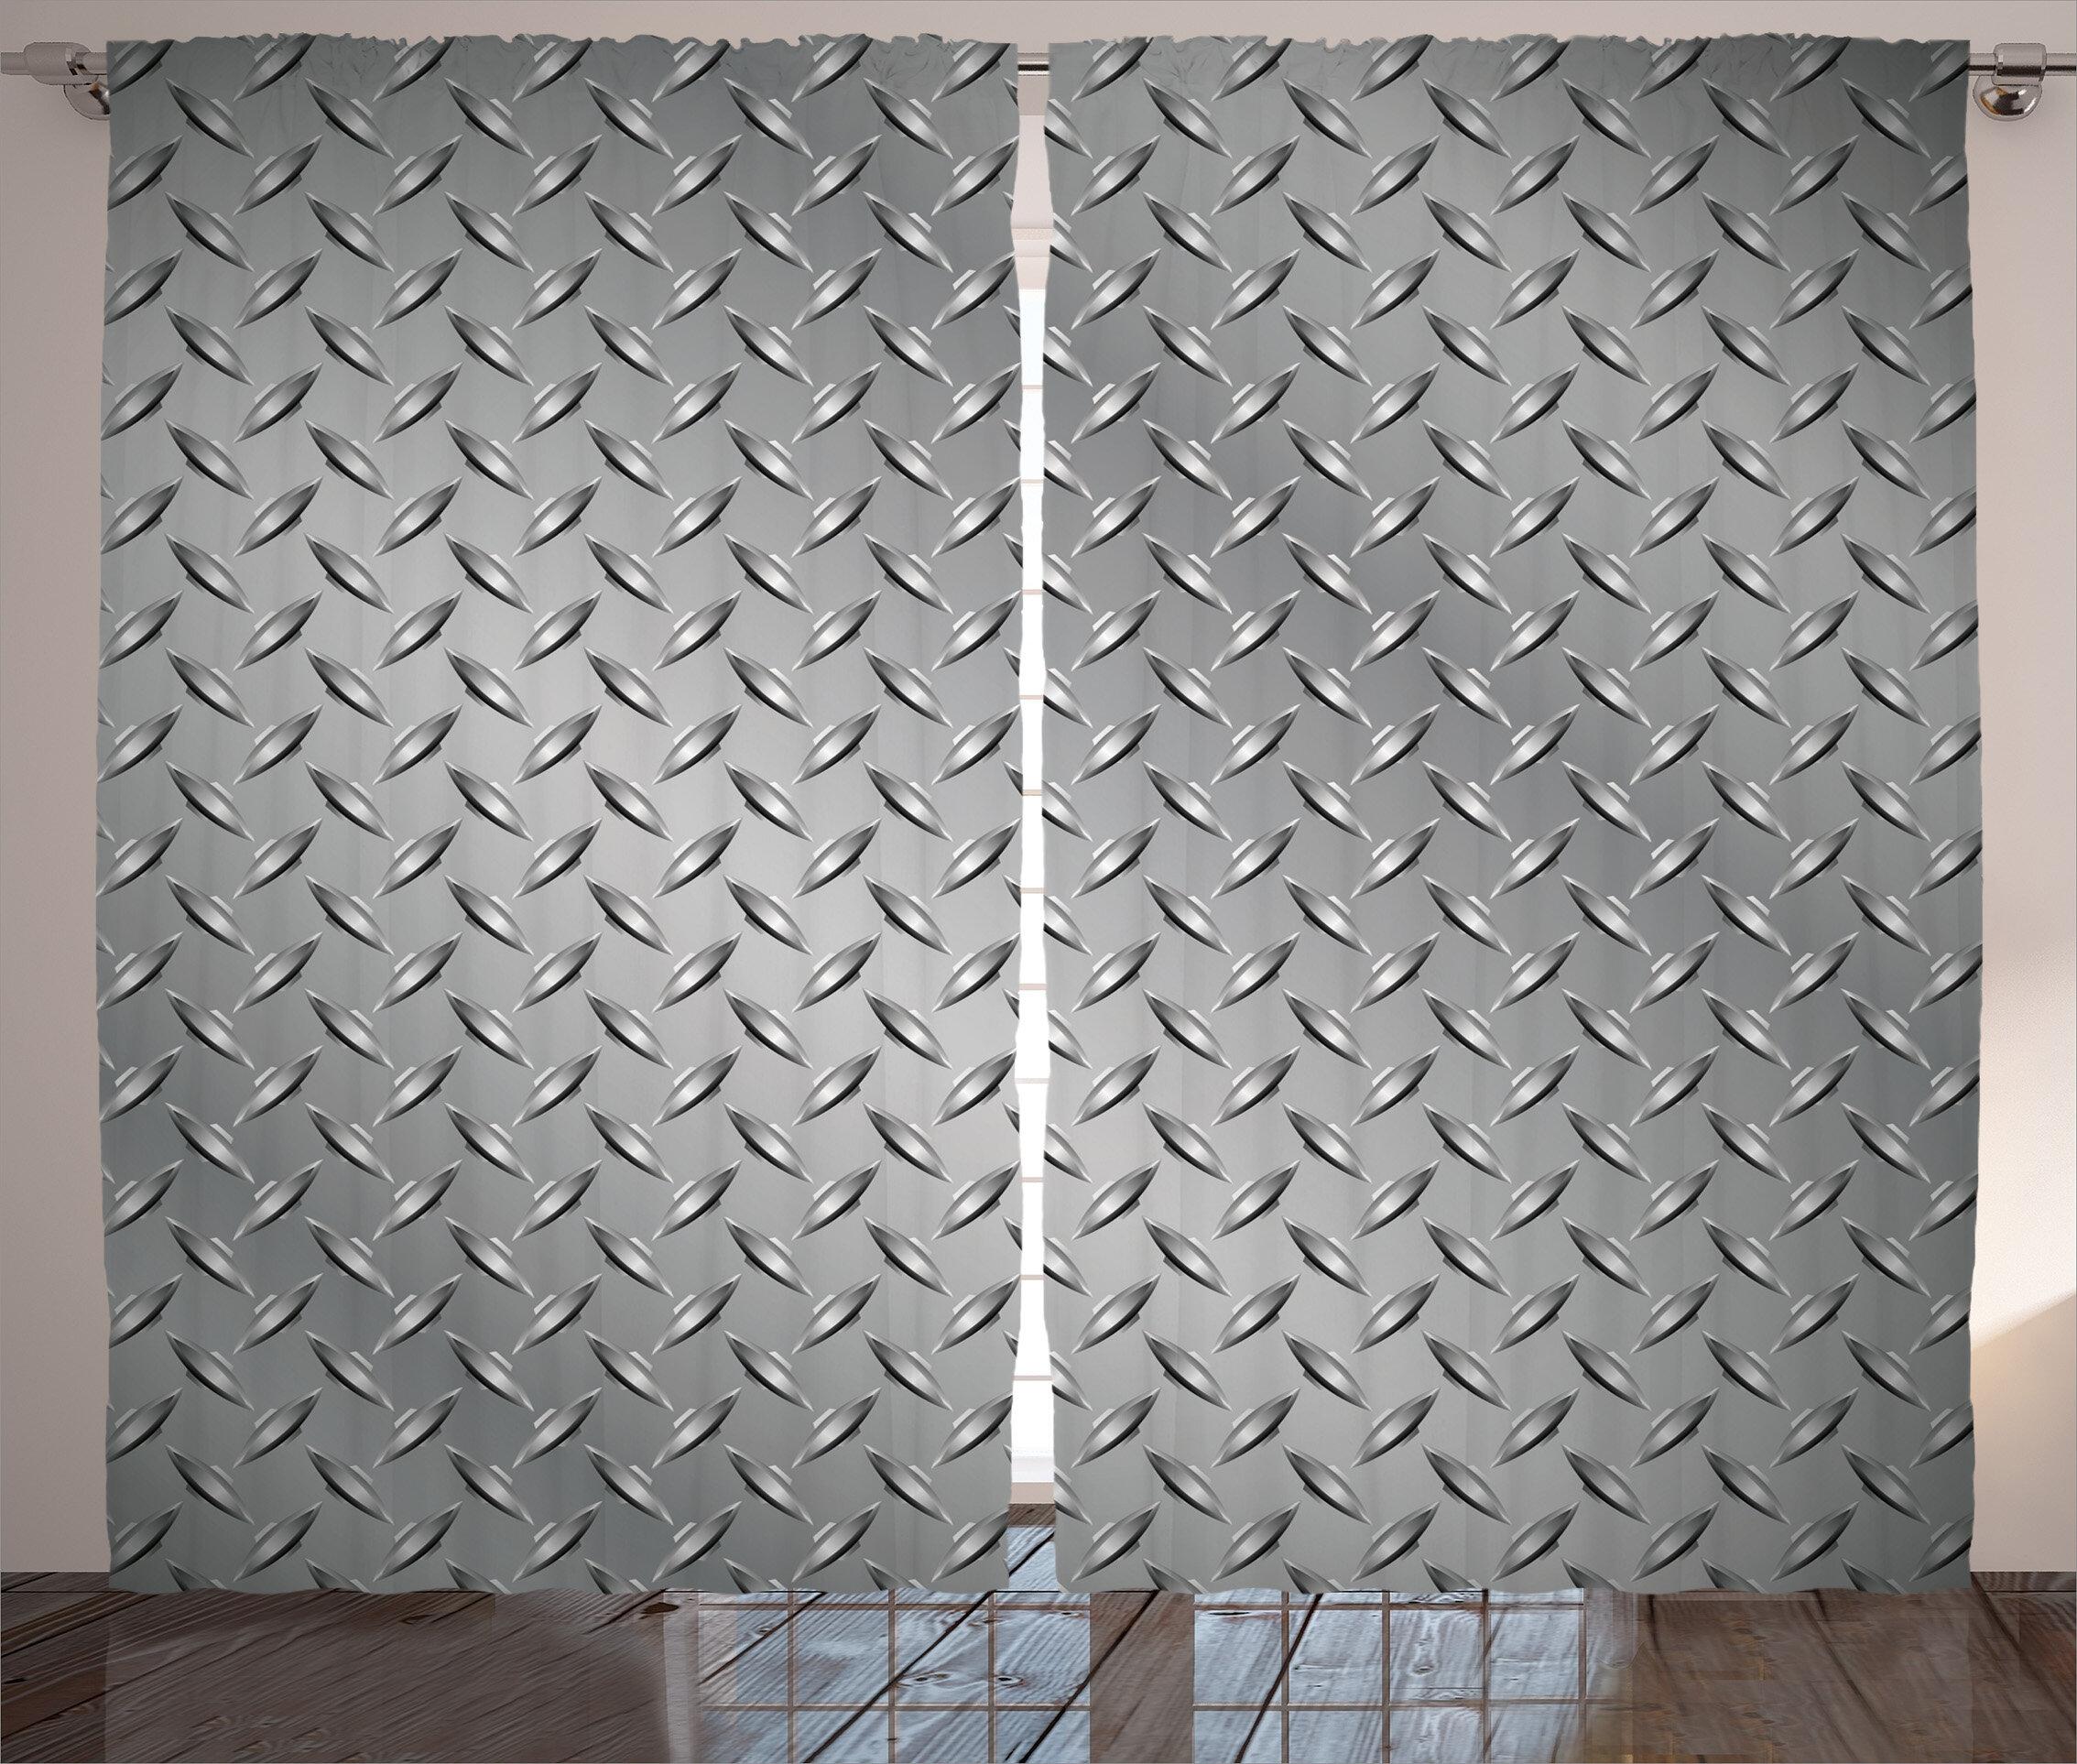 East Urban Home Grey Cross Wire Fence Netting Display with Diamond ...